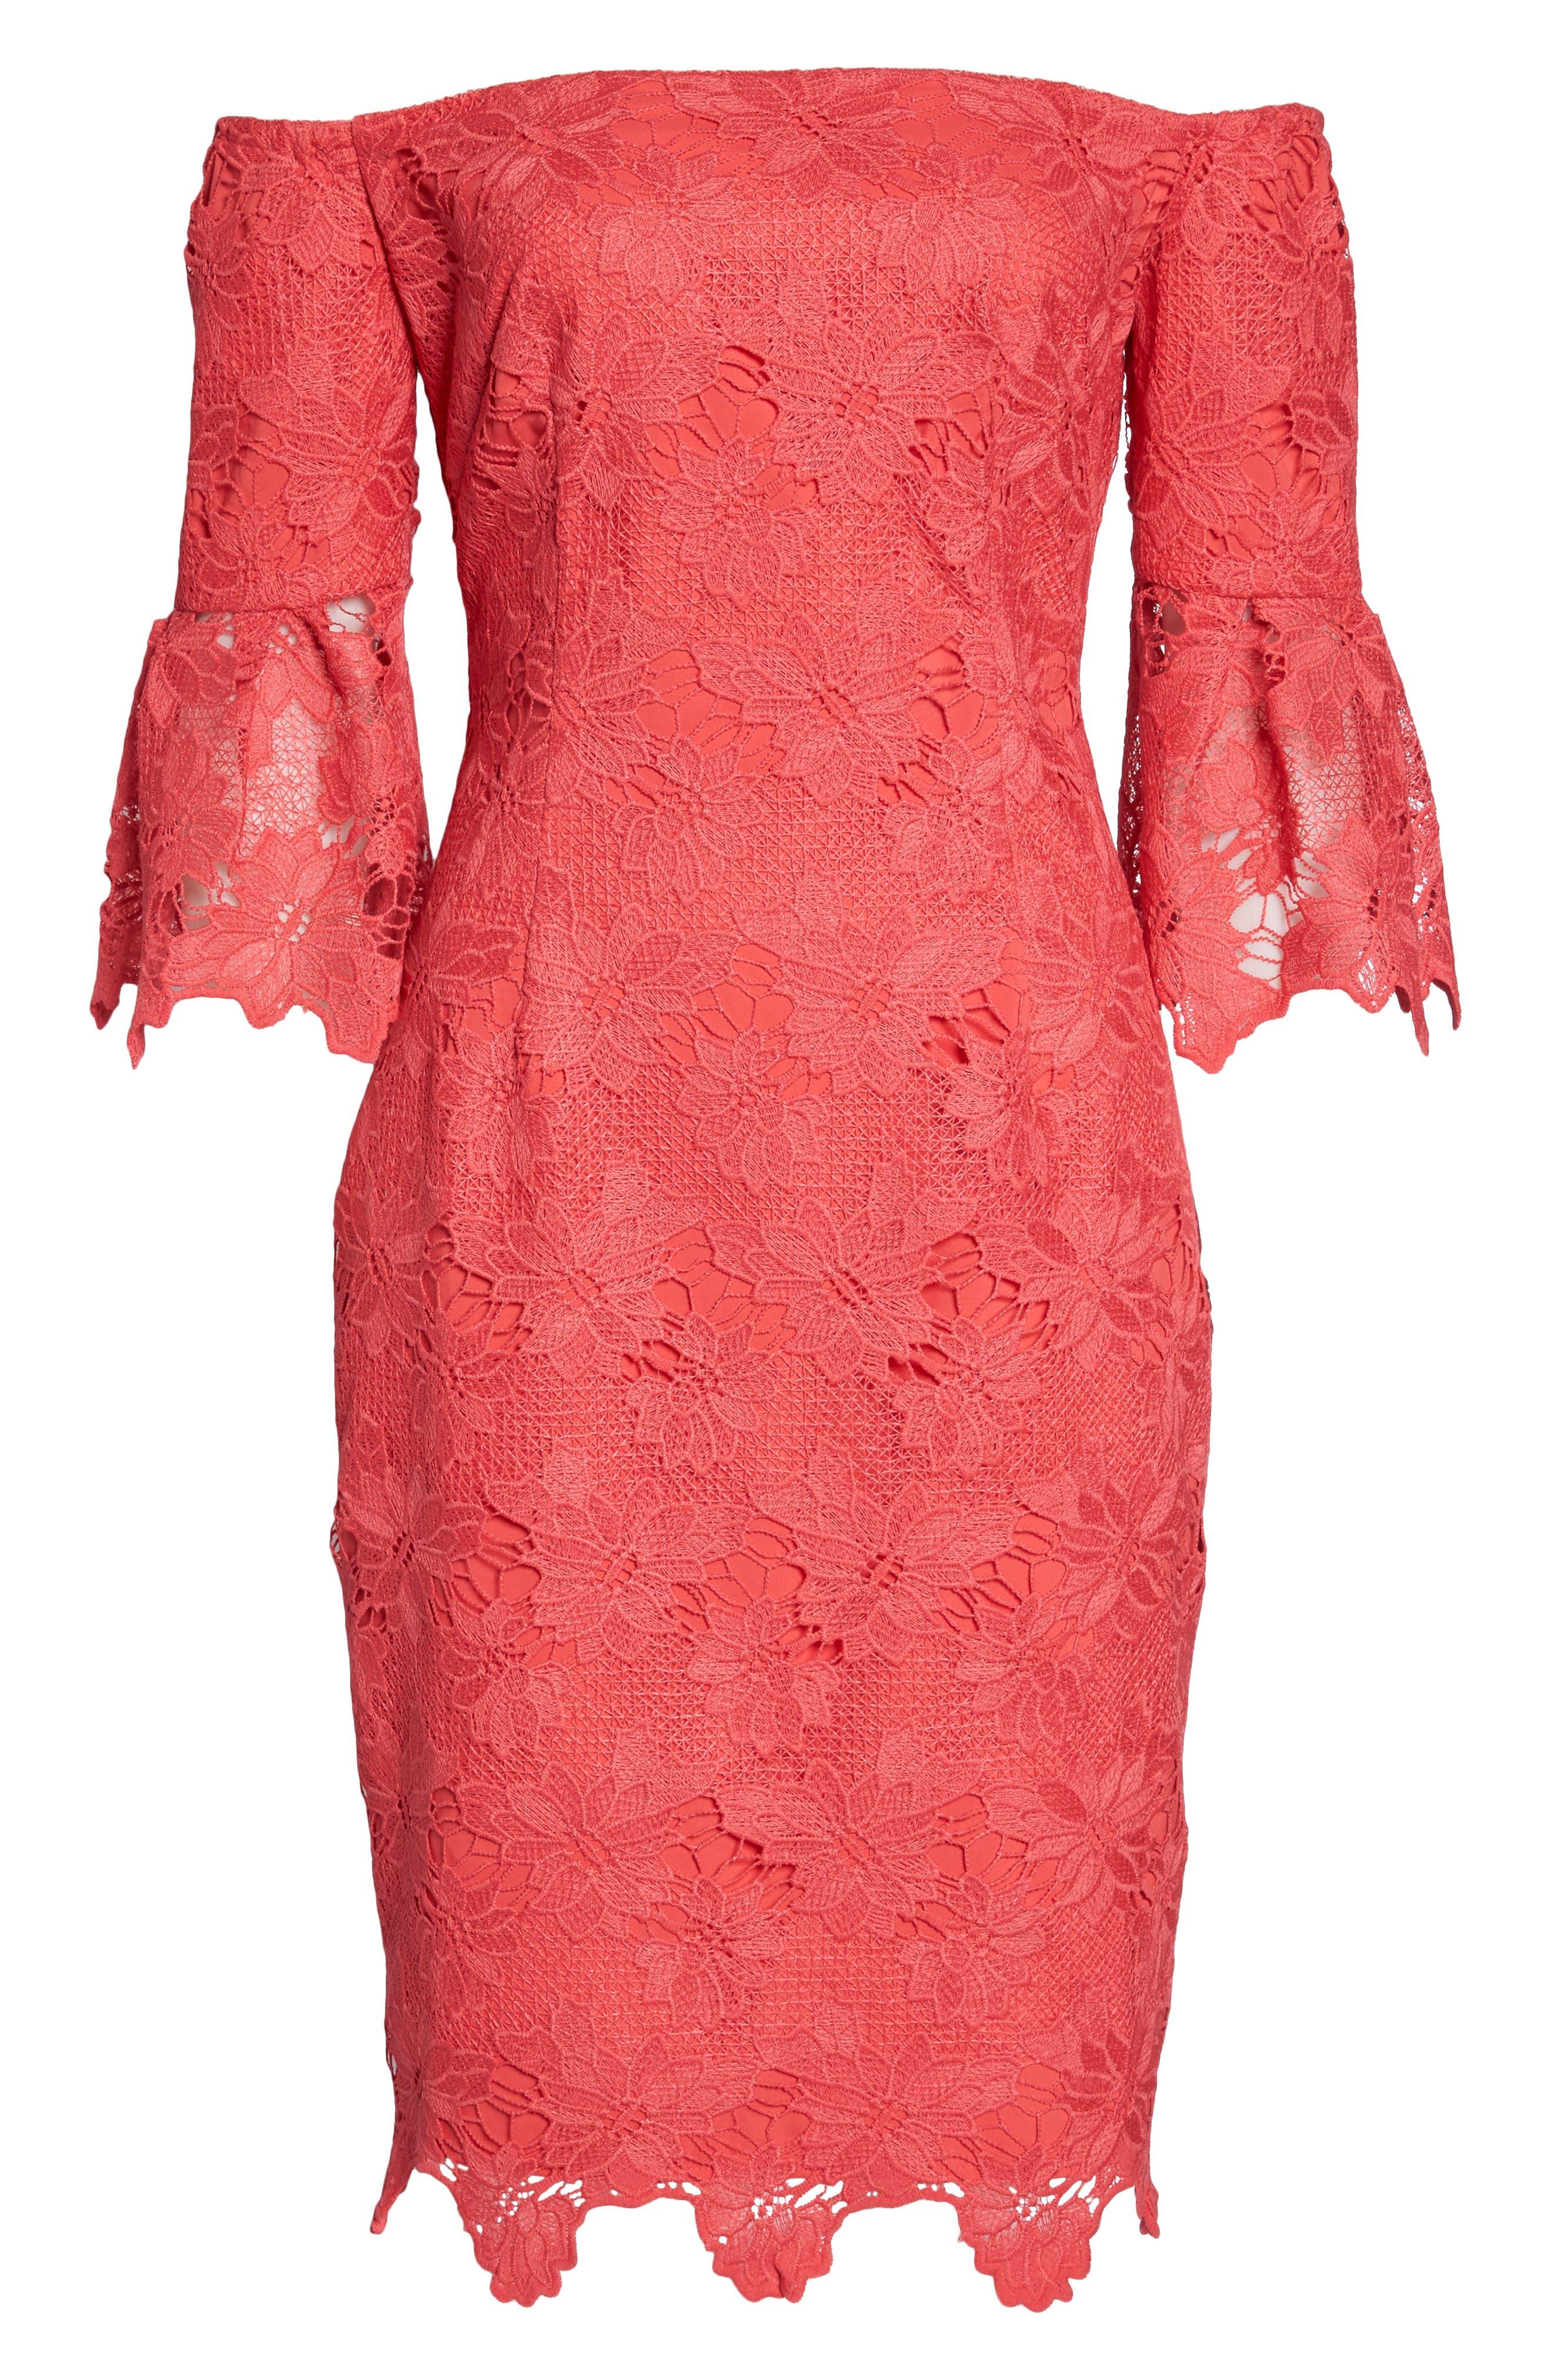 Poppy Off the Shoulder Lace Dress,                             Alternate thumbnail 6, color,                             Poppy